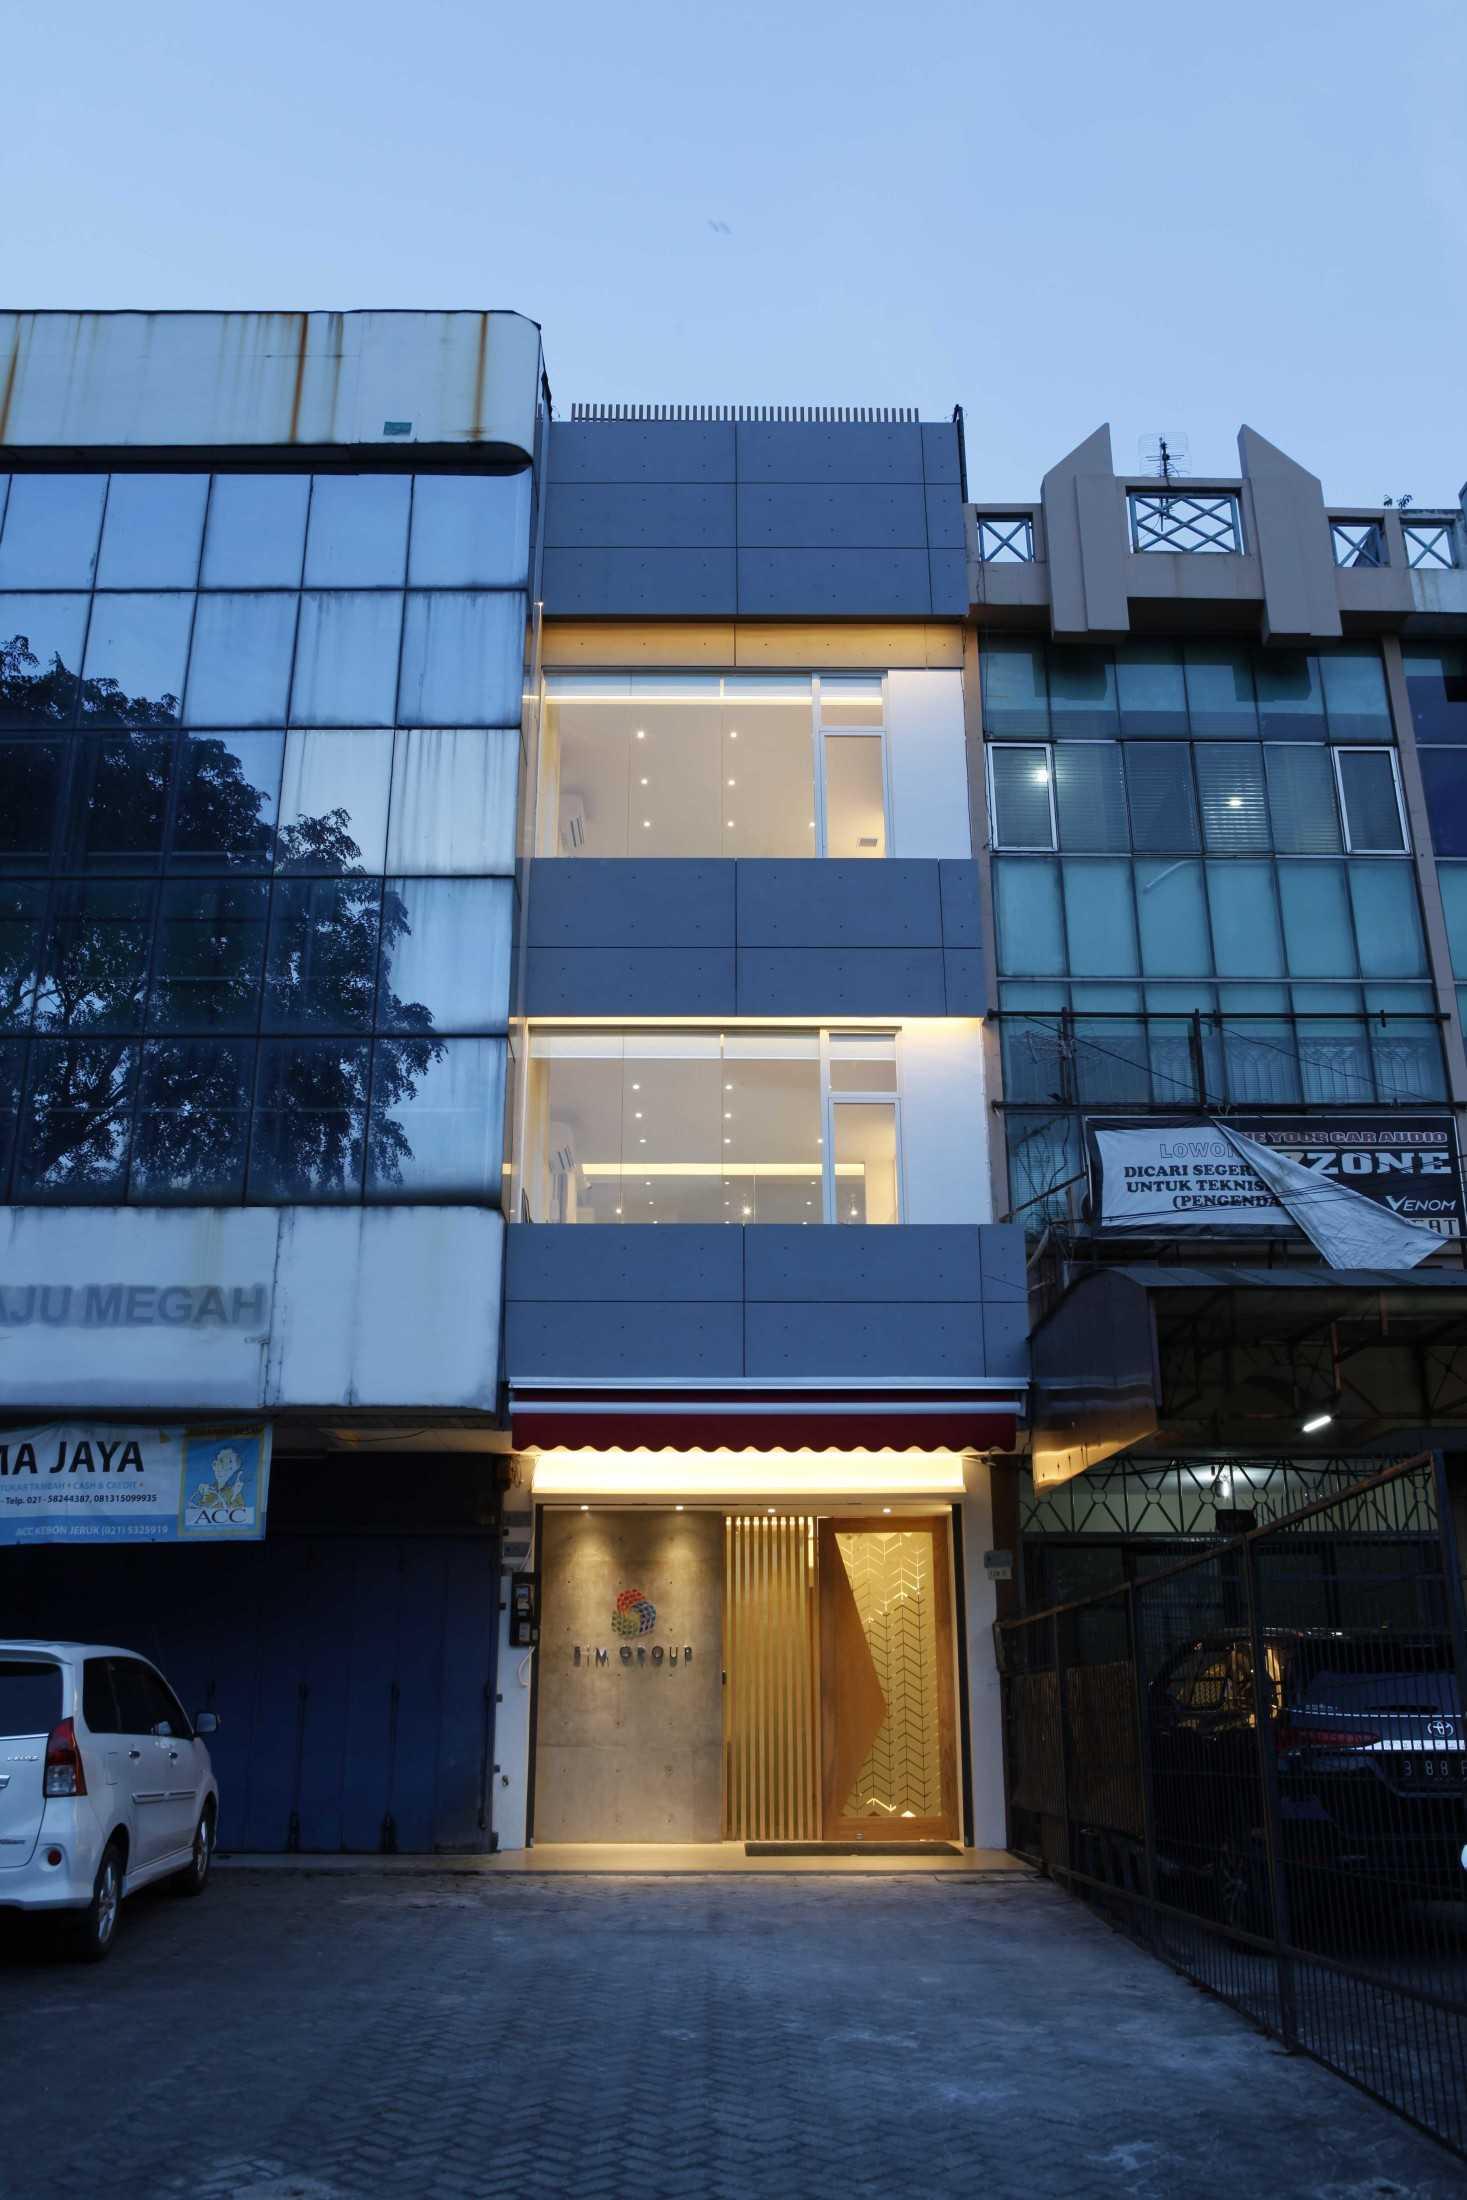 Design Intervention Simland Office Jakarta, Daerah Khusus Ibukota Jakarta, Indonesia Jakarta, Daerah Khusus Ibukota Jakarta, Indonesia Design-Intervention-Simland-Office  71076